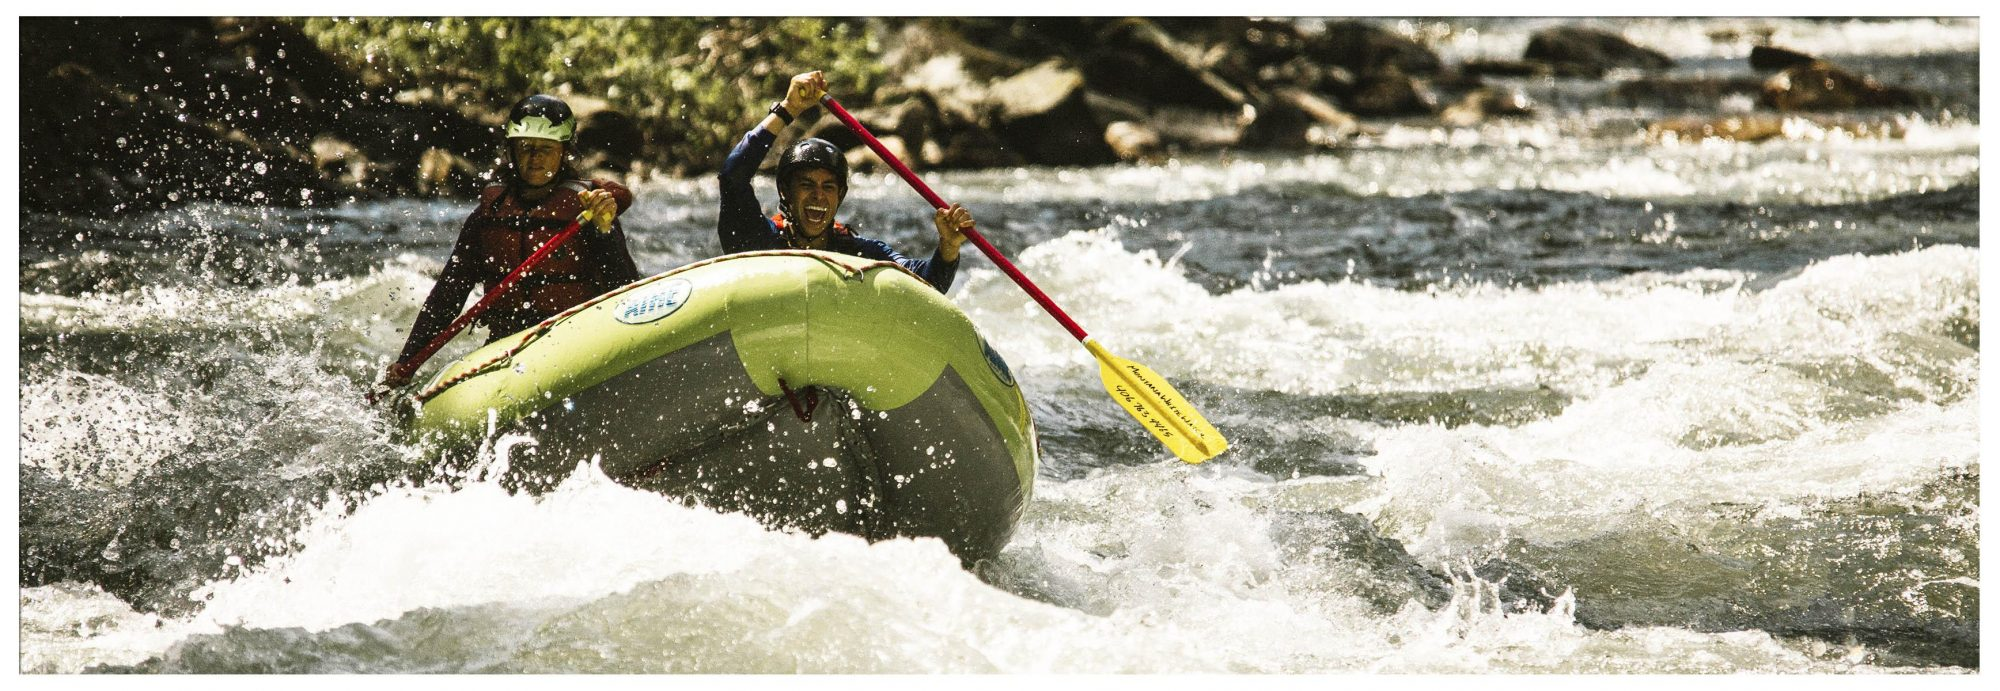 HA rafting 5 c